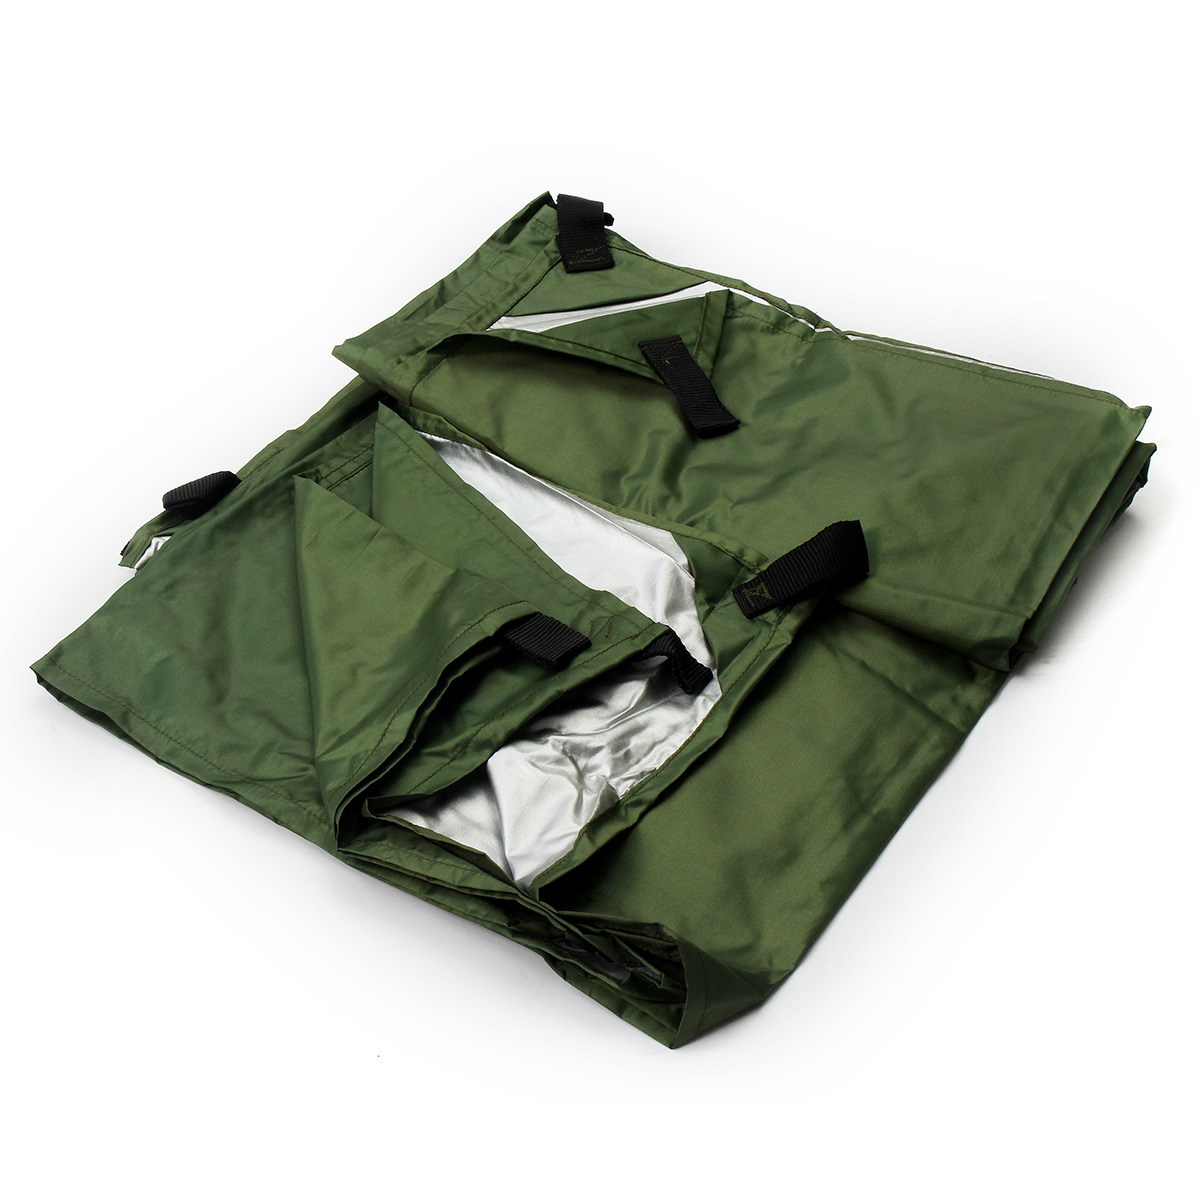 3 mt x 3 mt Wasserdicht Sun Shelter Tarp Überleben Camping Klettern Outdoor Zelt Terrasse Sonne Schatten Markise Baldachin Garten RU/CN zelt Schatten